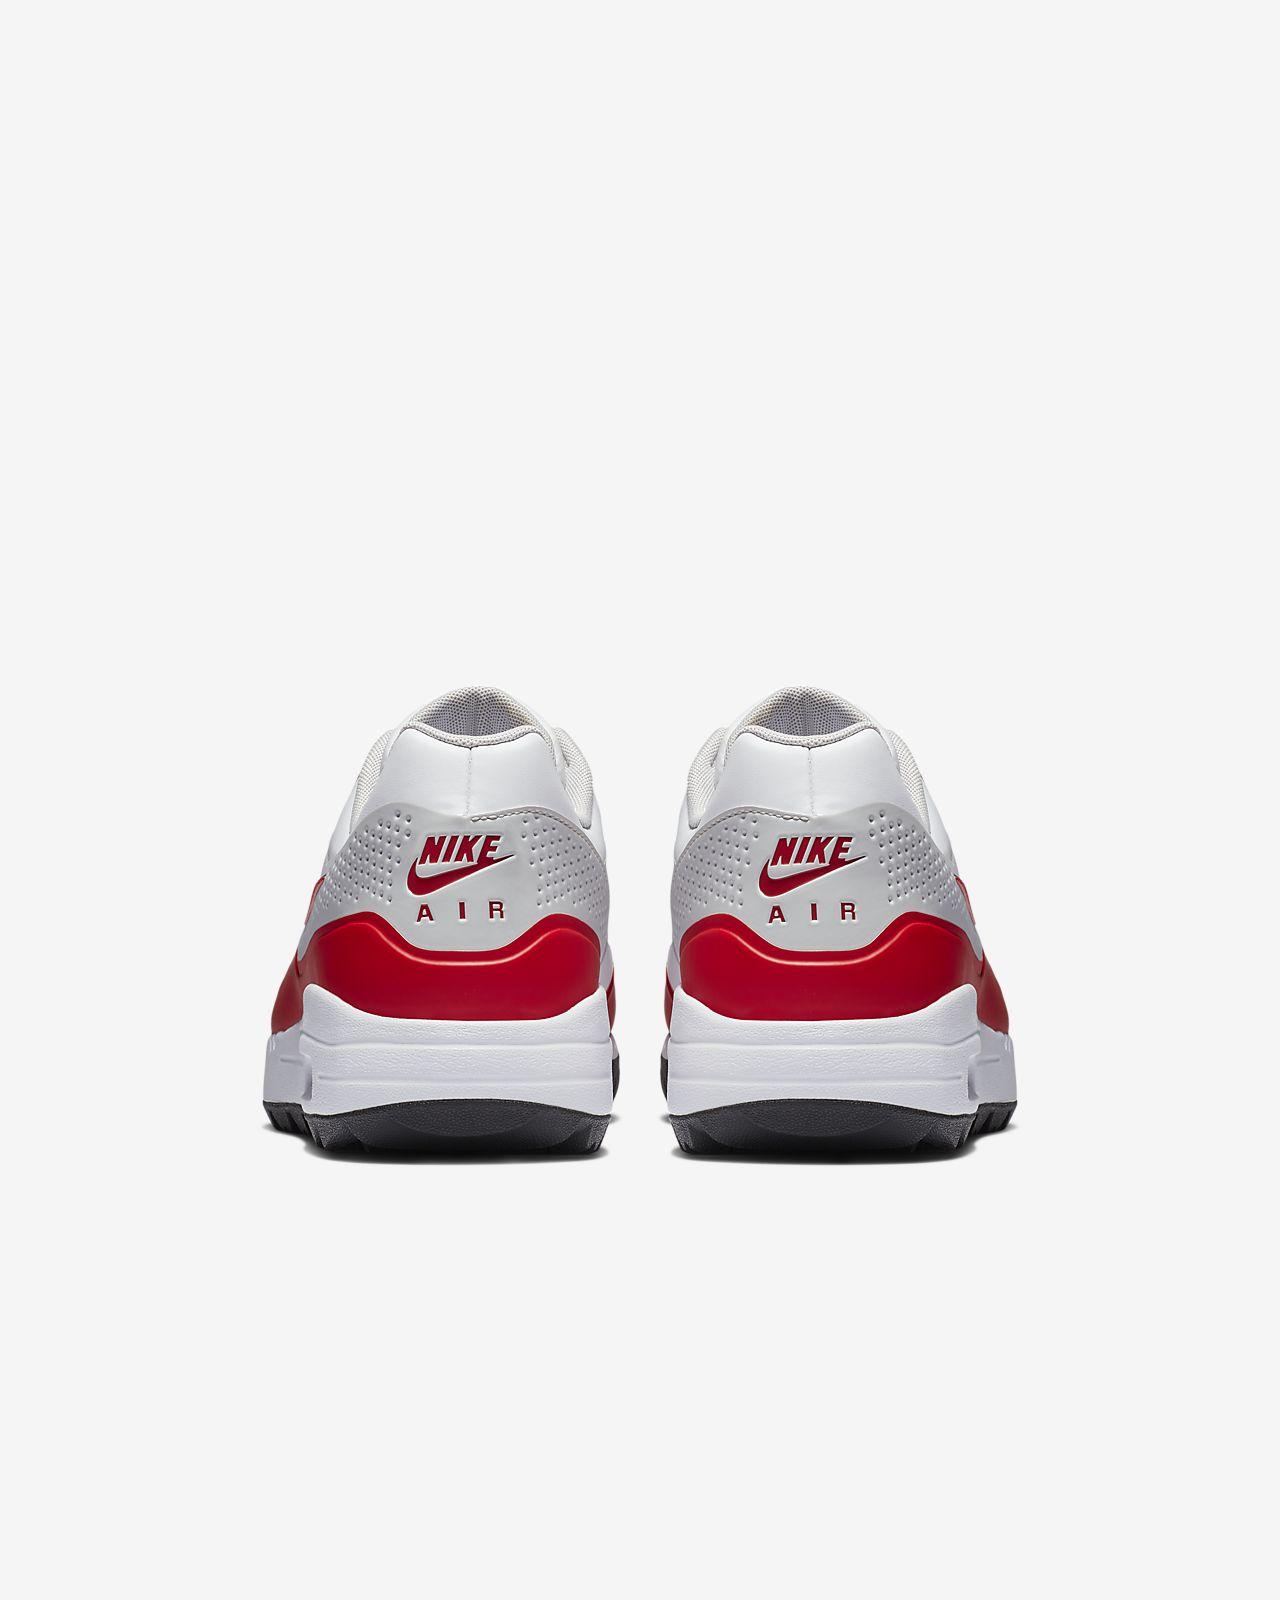 sports shoes 6c6fe f5e8a ... Chaussure de golf Nike Air Max 1 G pour Homme